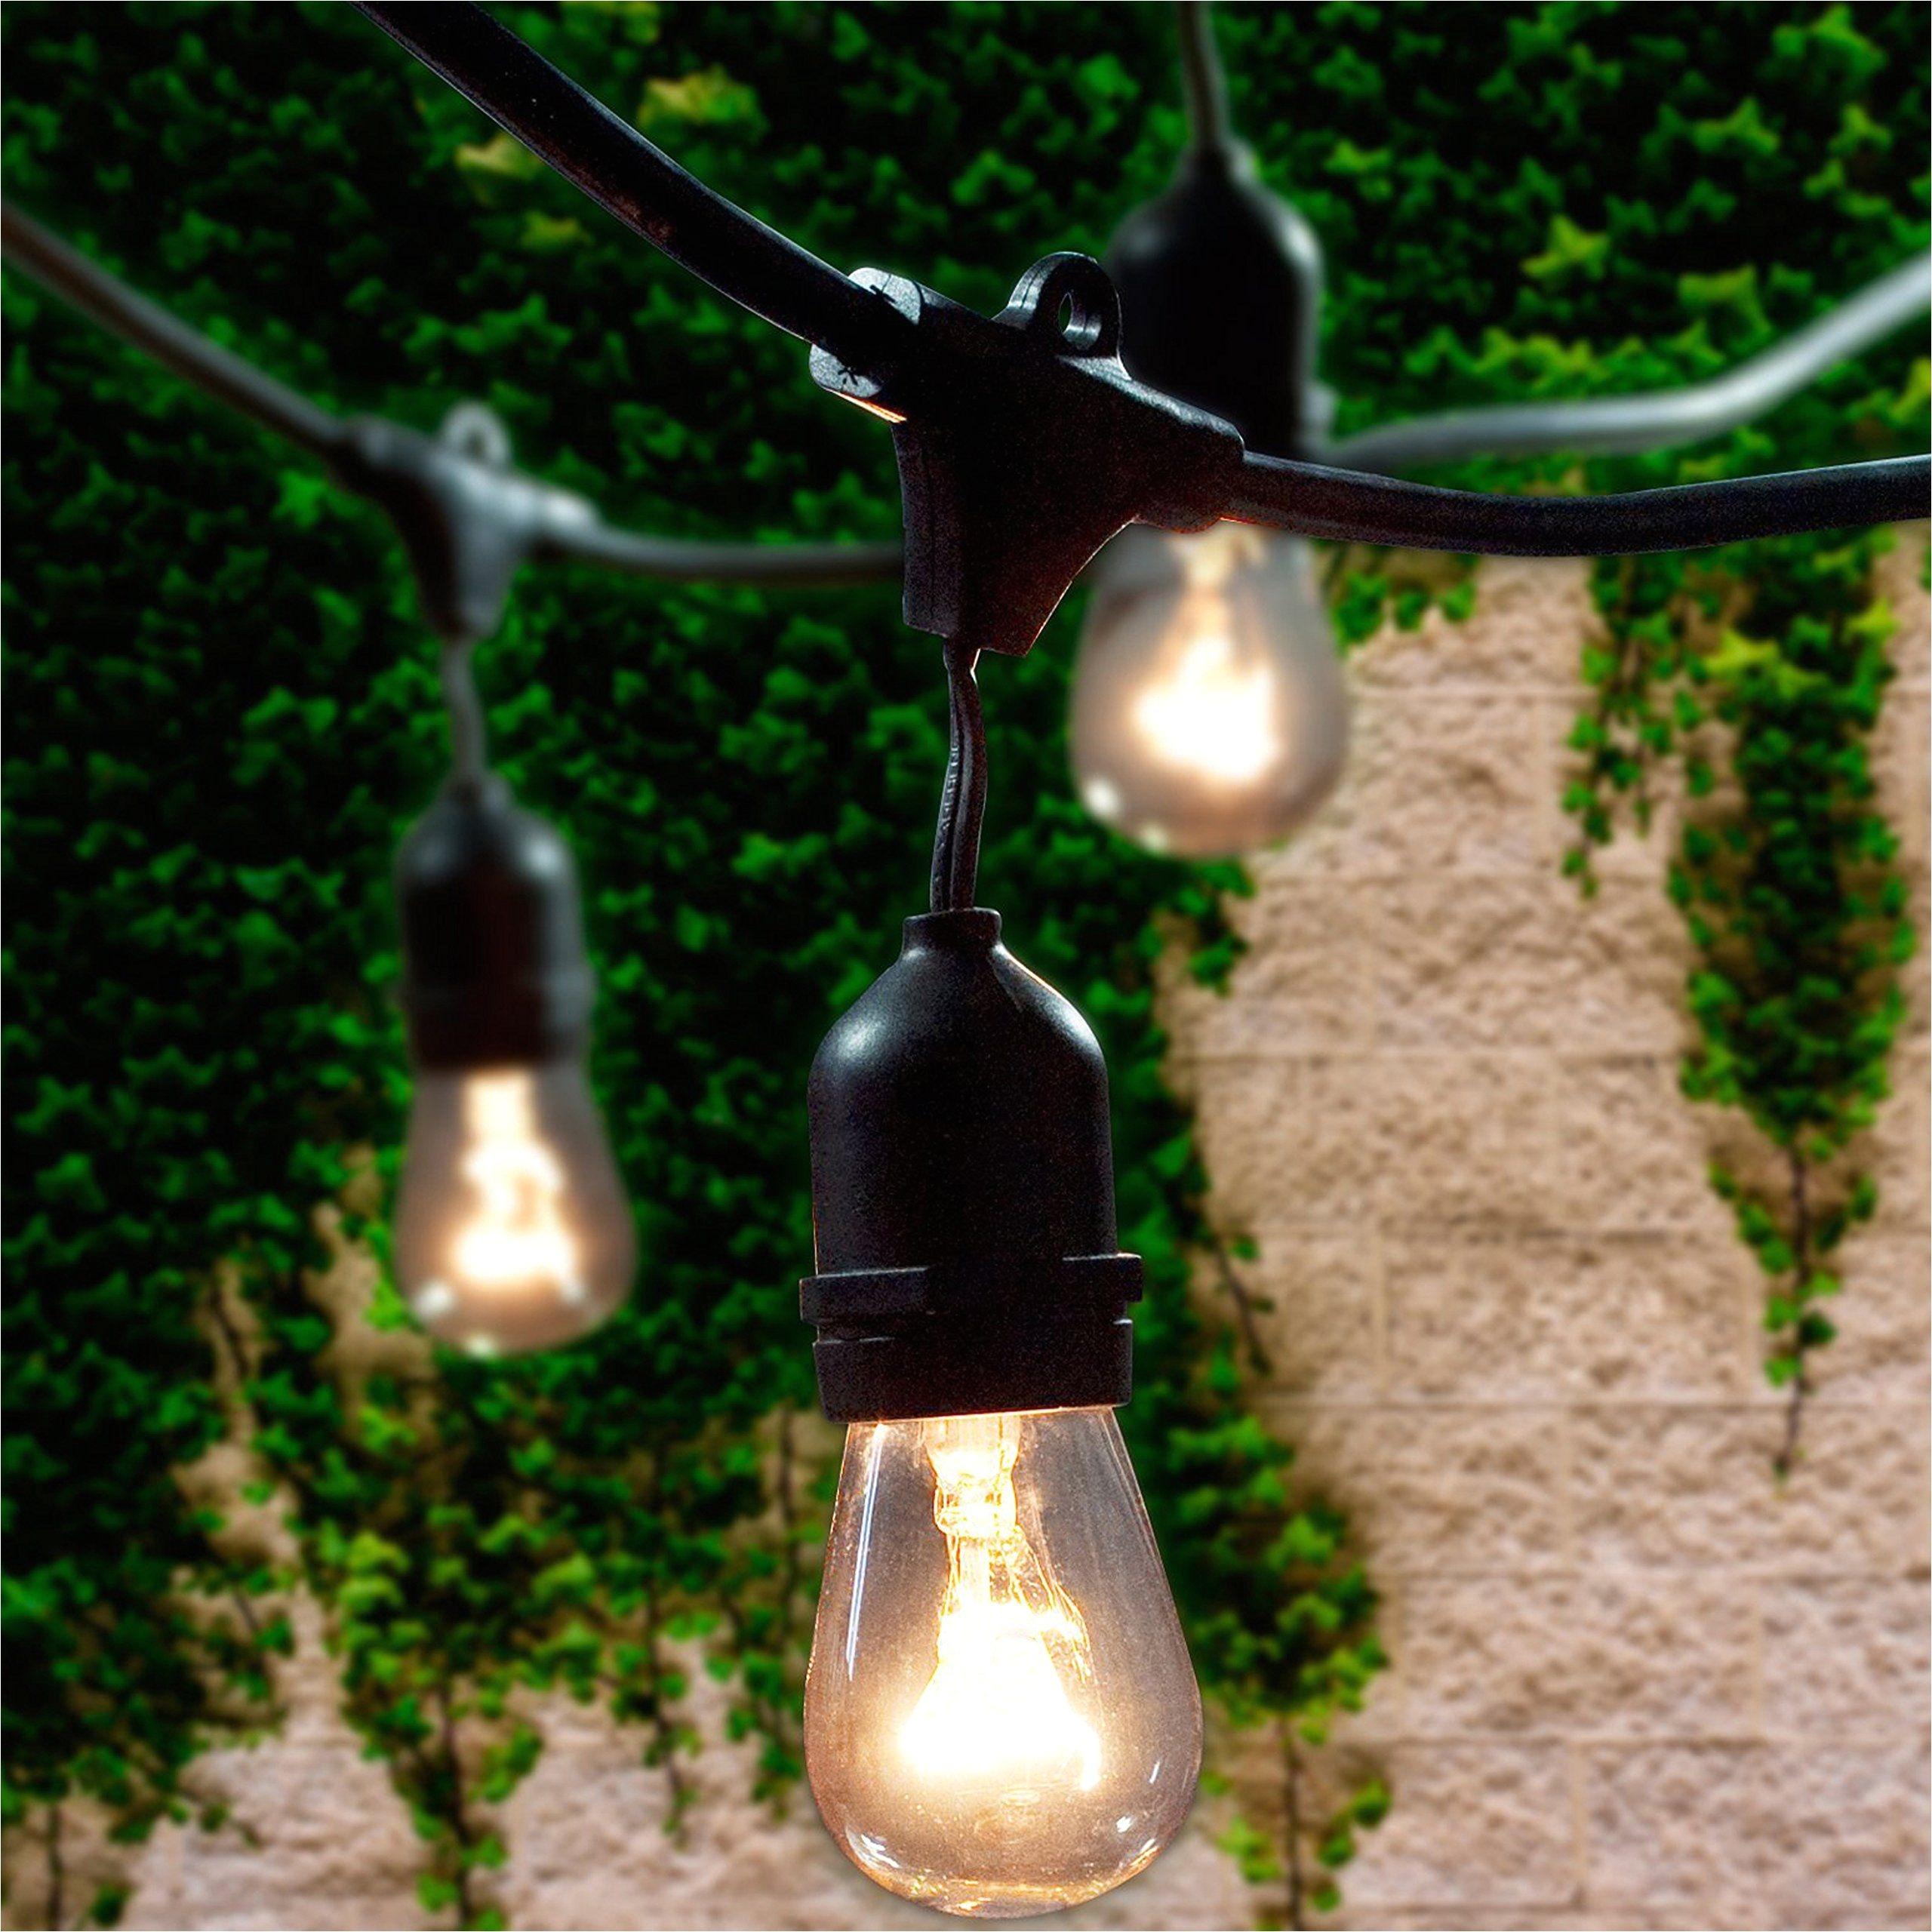 lemontec commercial grade outdoor string lights with 15 hanging sockets 48 ft black weatherproof cord